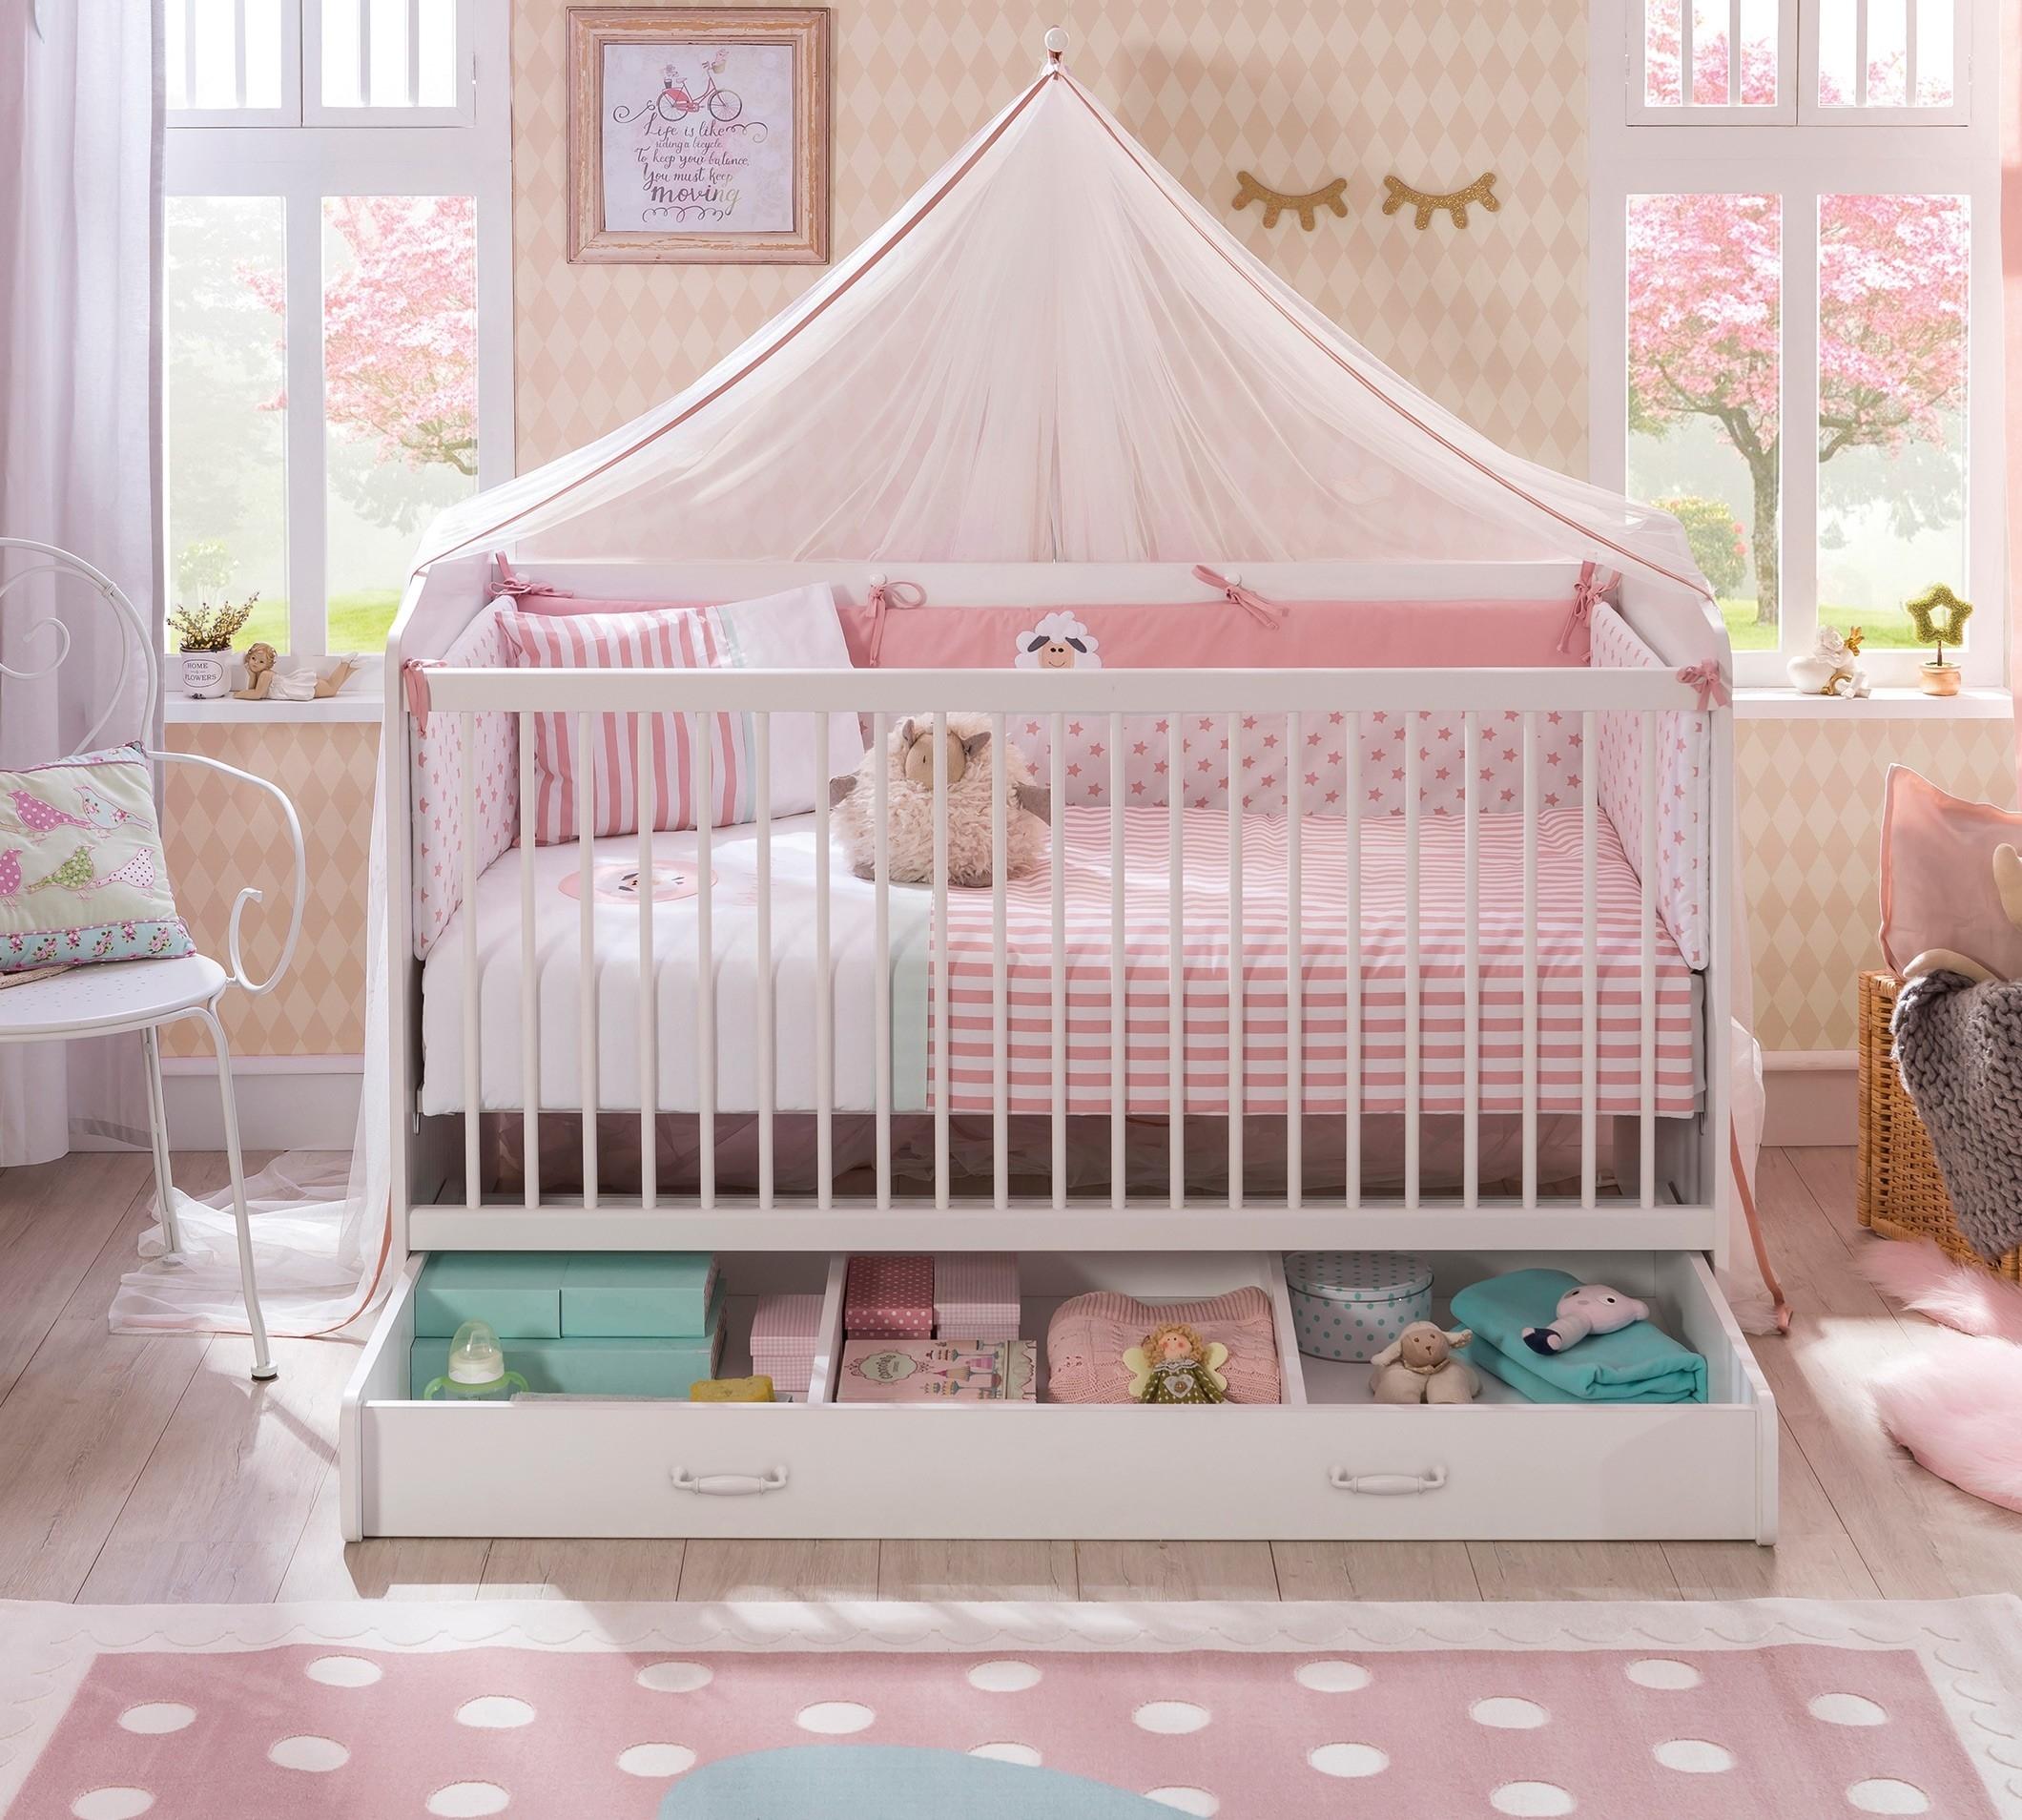 Patut din pal cu sertar pentru bebe Selena Baby II White 140 x 70 cm